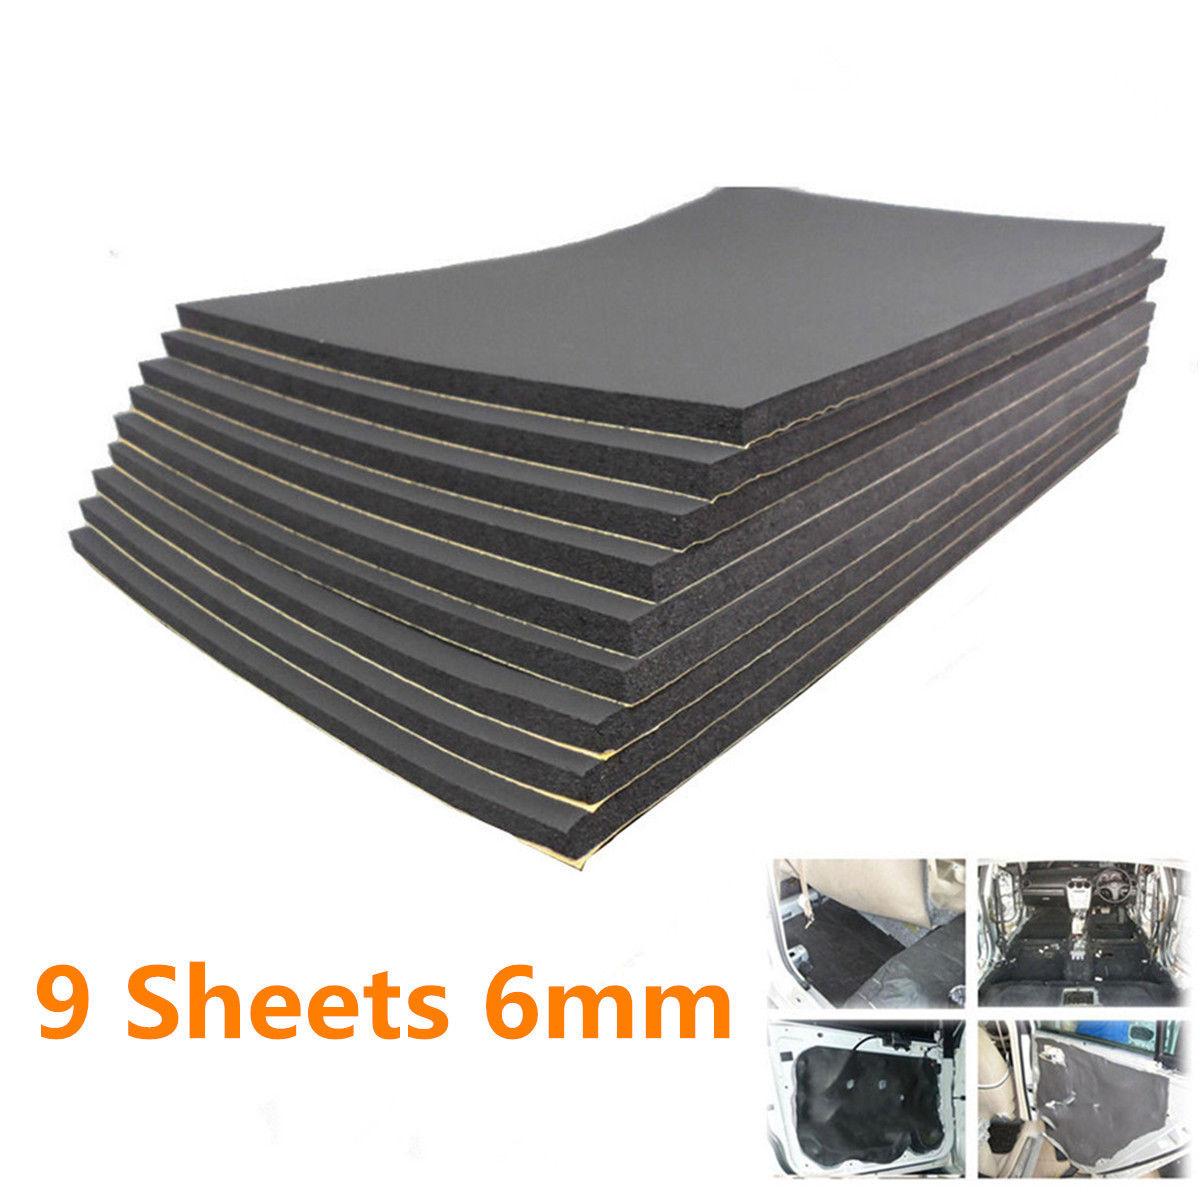 9Pcs Car Auto Van Sound Proofing Deadening Insulation Foam 30cm*50cm*6mm Noise Insulation Deadening Mat Hood Closed Cell Foam